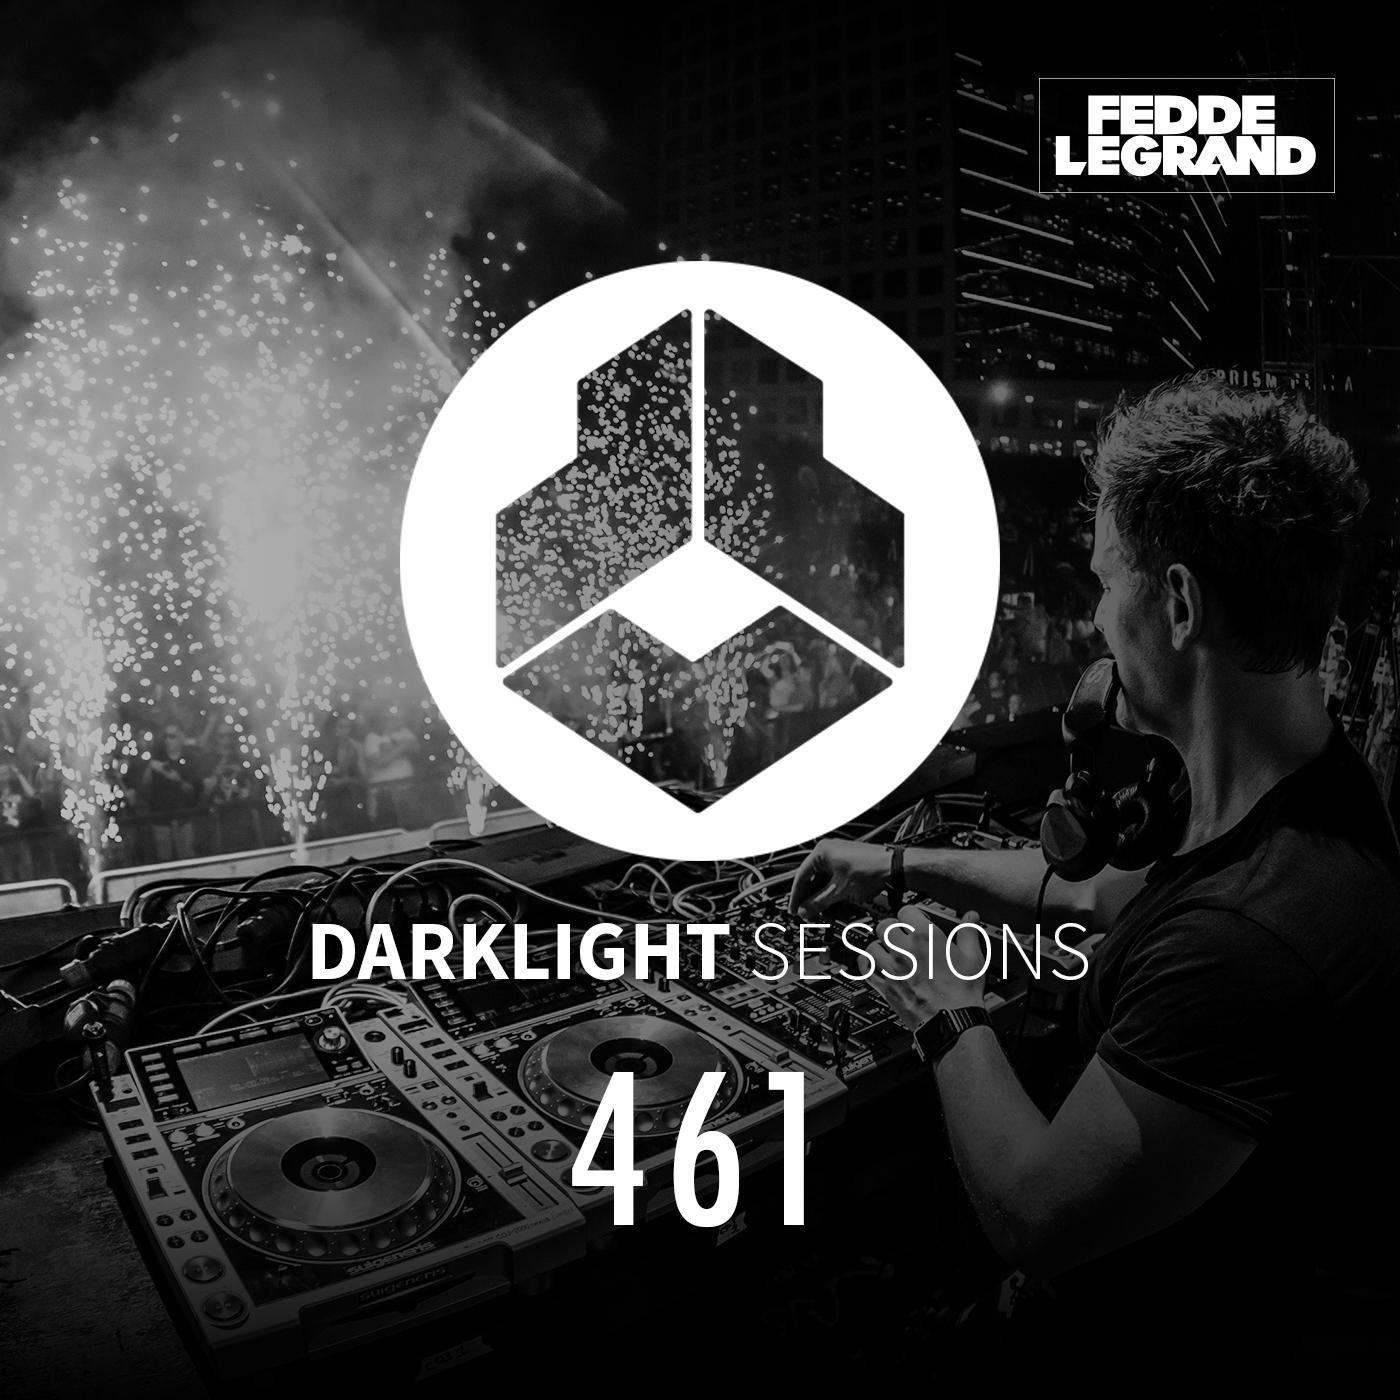 Darklight Sessions 461